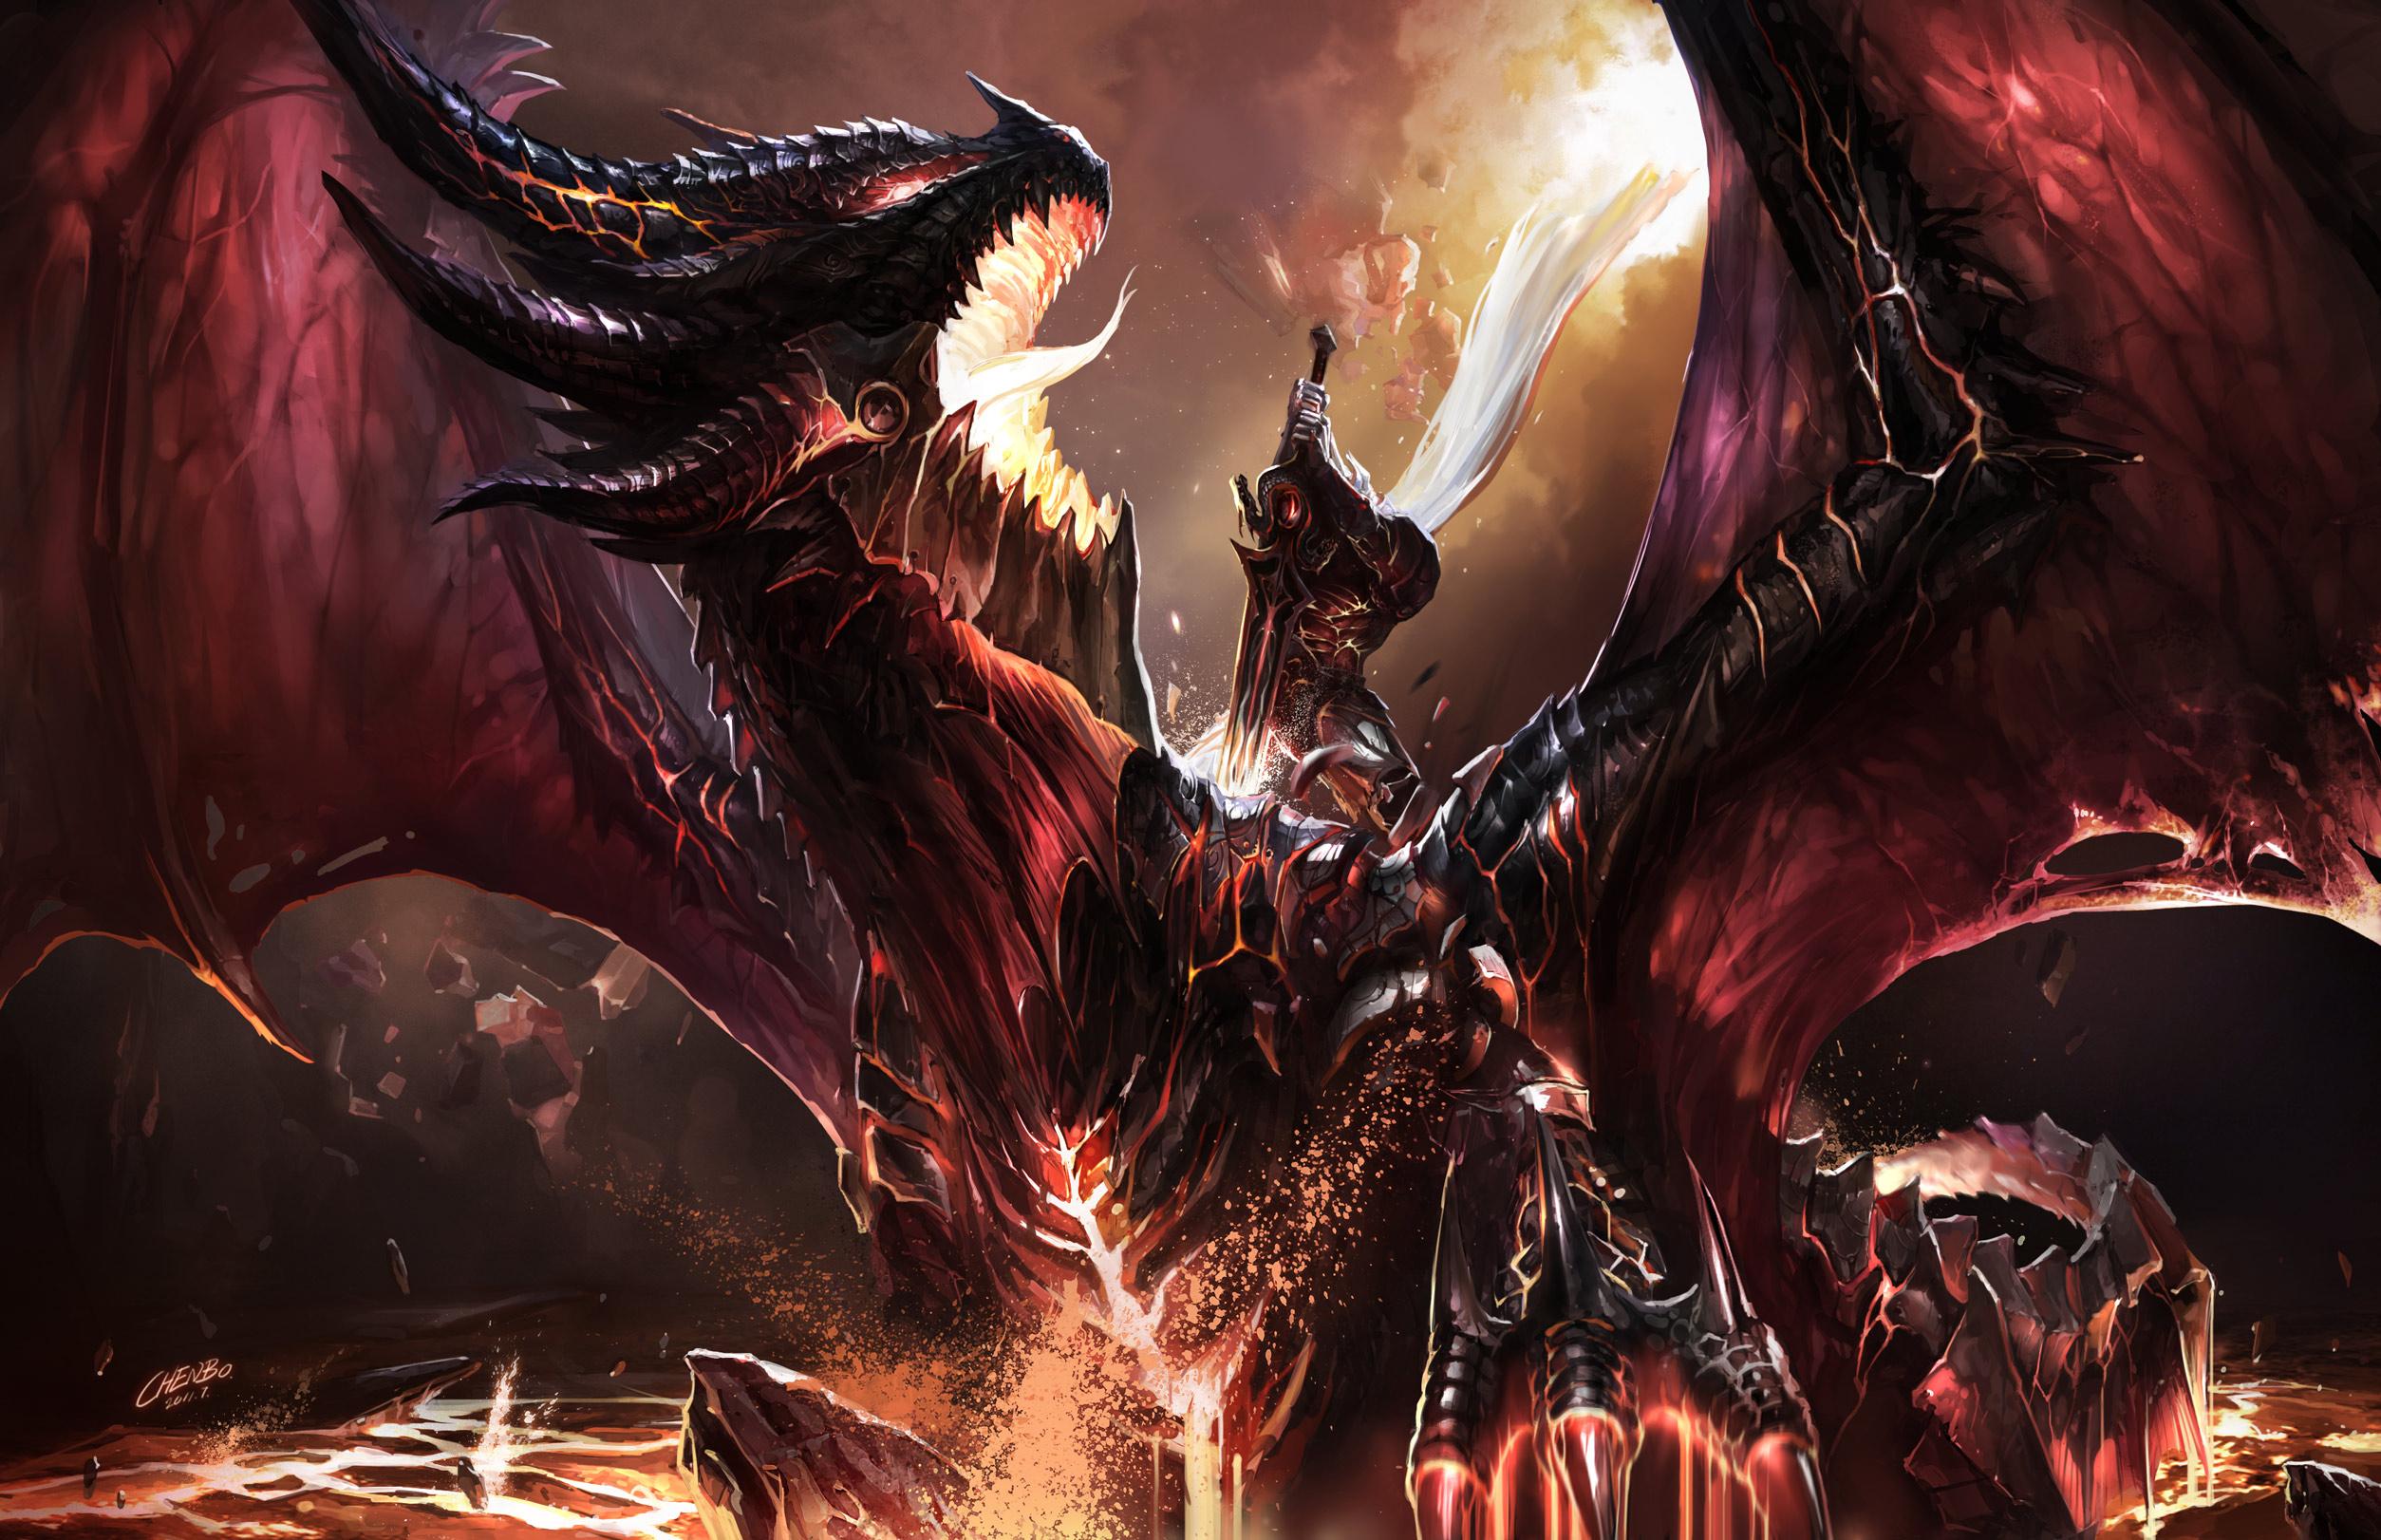 Dragon Warrior Sword World of Warcraft WOW fantasy wallpaper 2508x1622